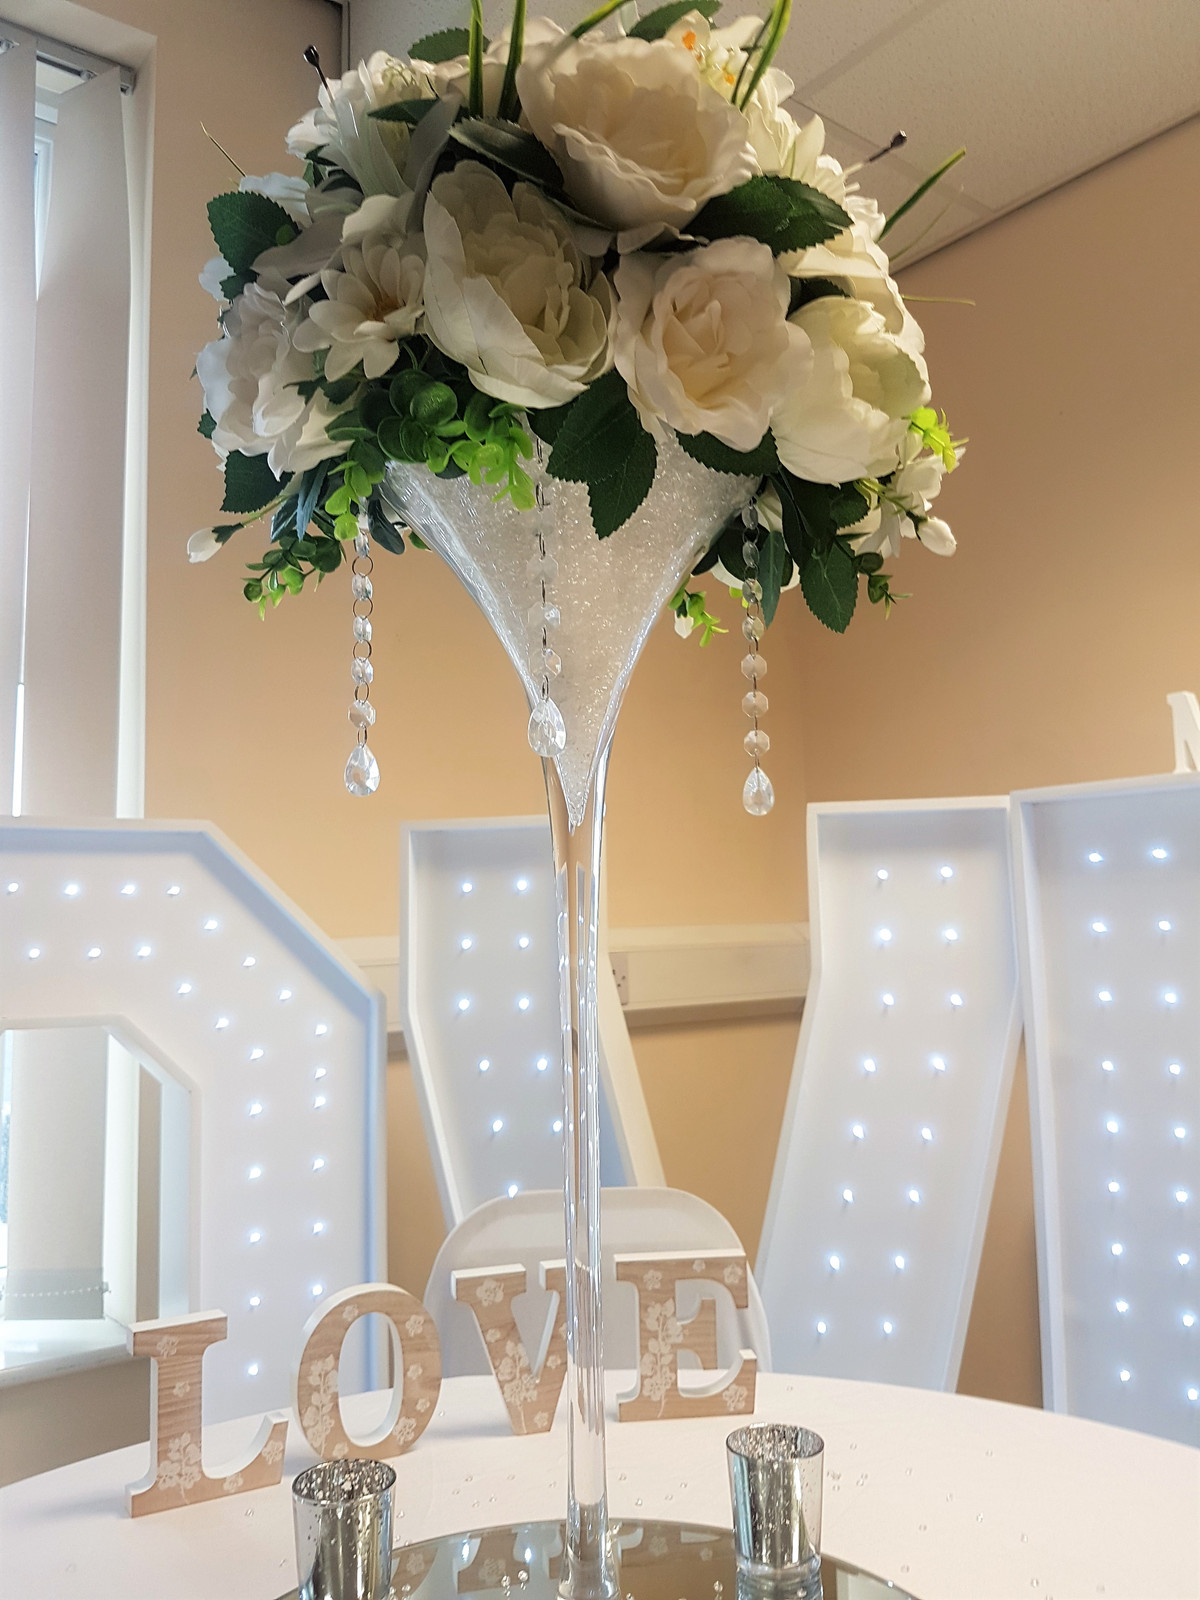 wedding chair covers derby wheelchair photo centrepiece hire derbyshire uk everlasting weddings